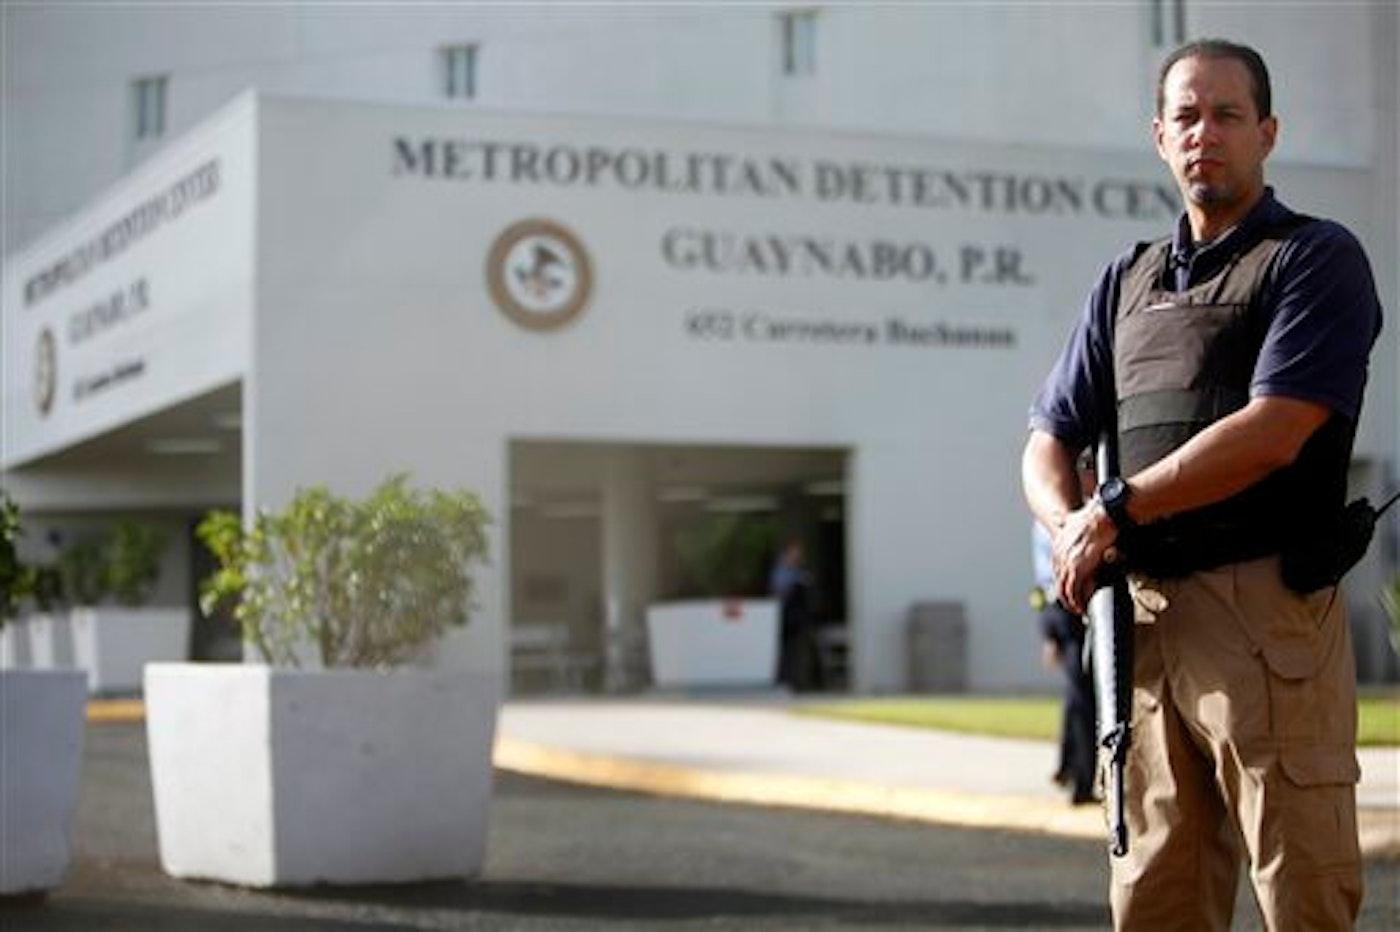 Puerto-Ric0-Detention-Center